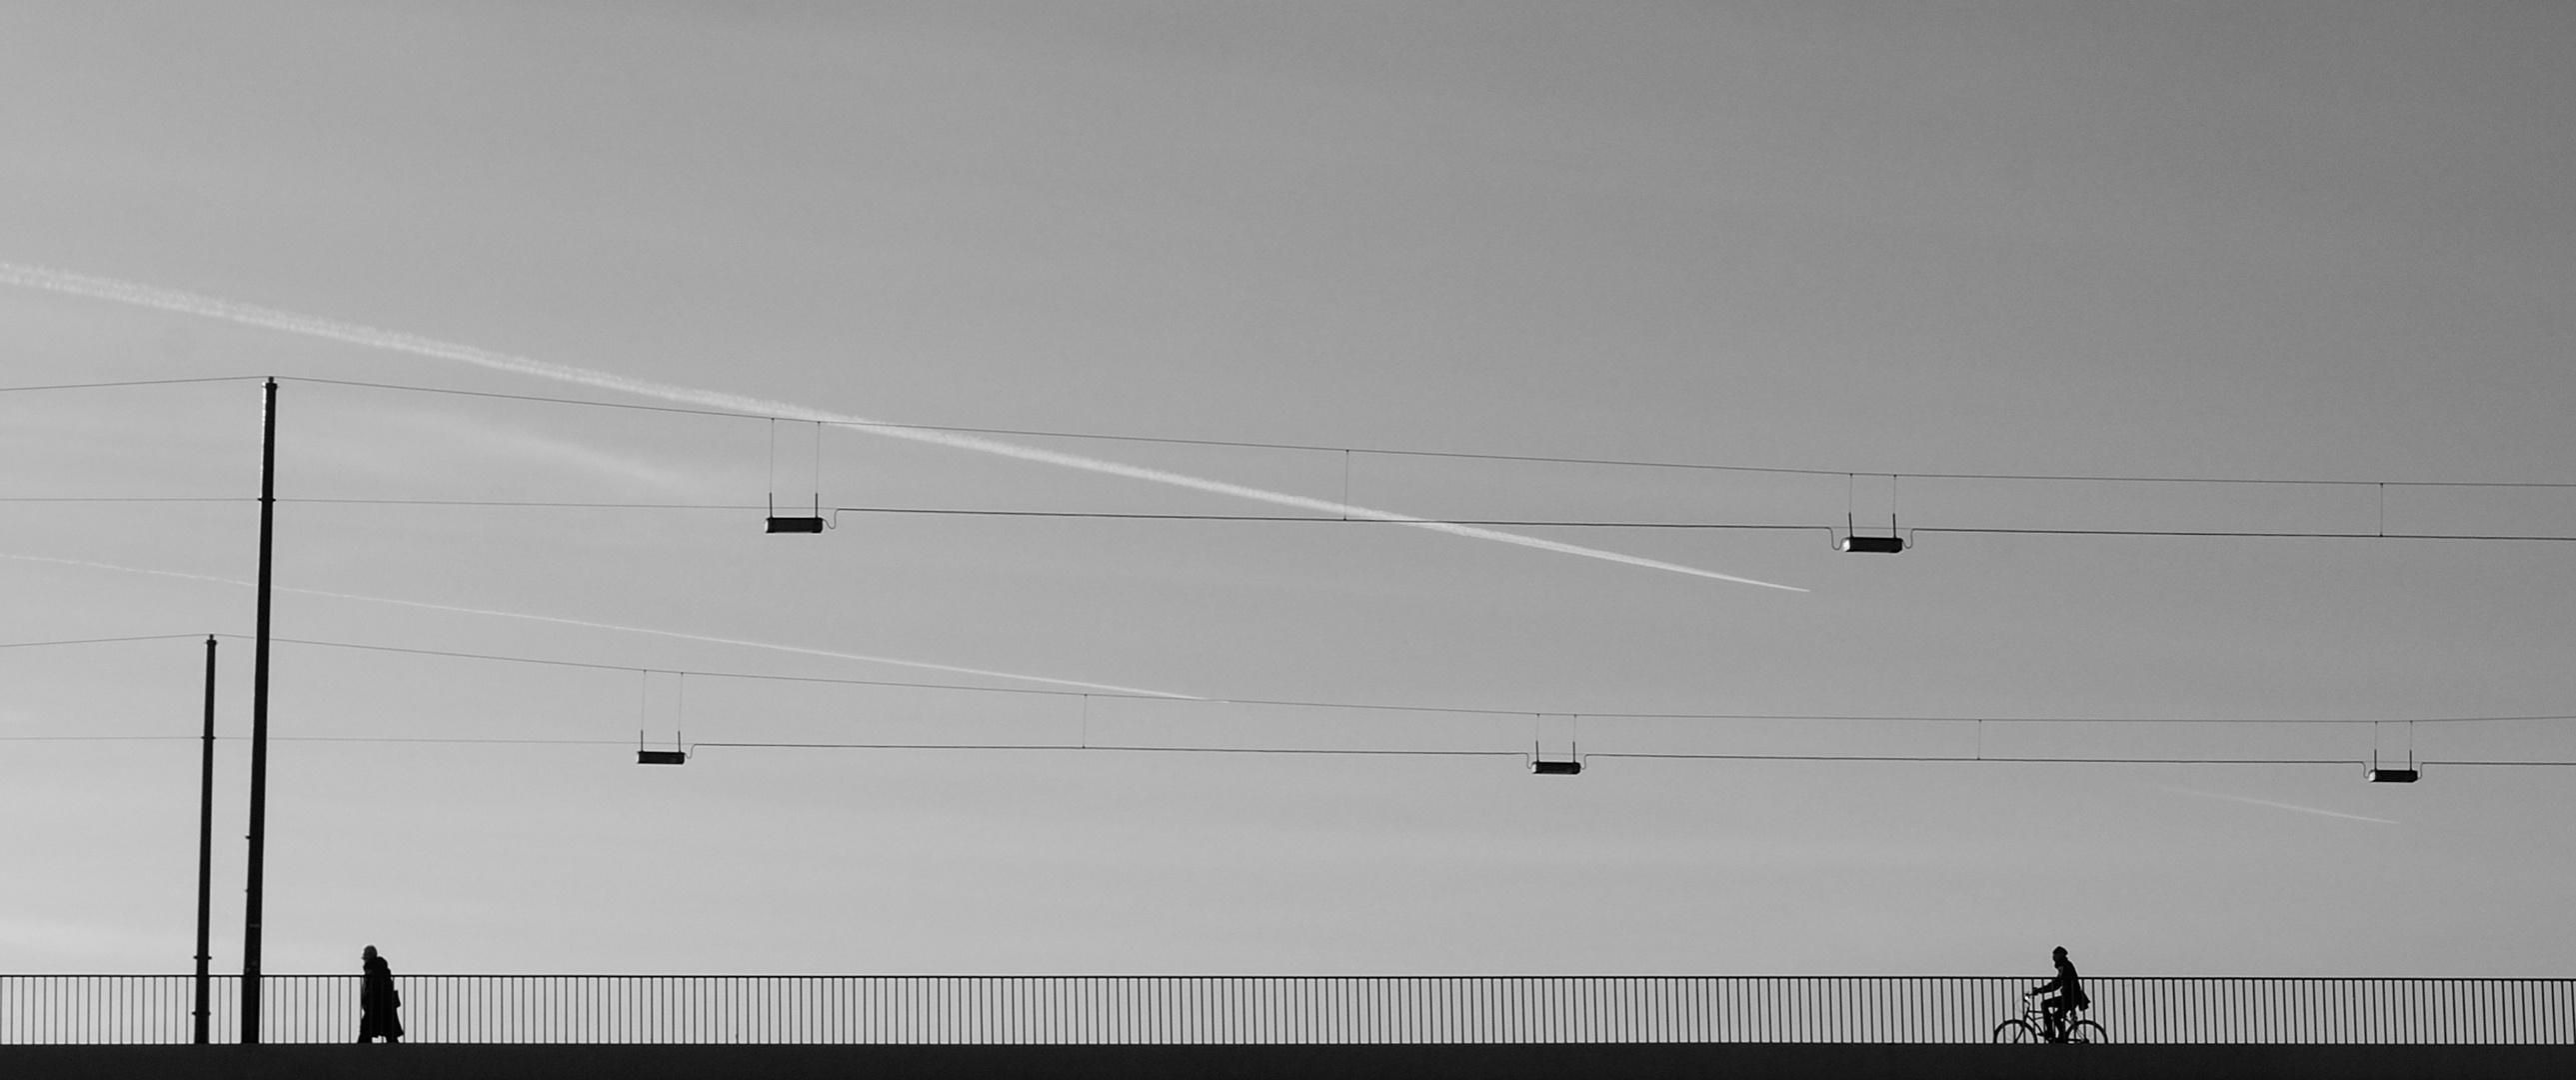 Urban loneliness I